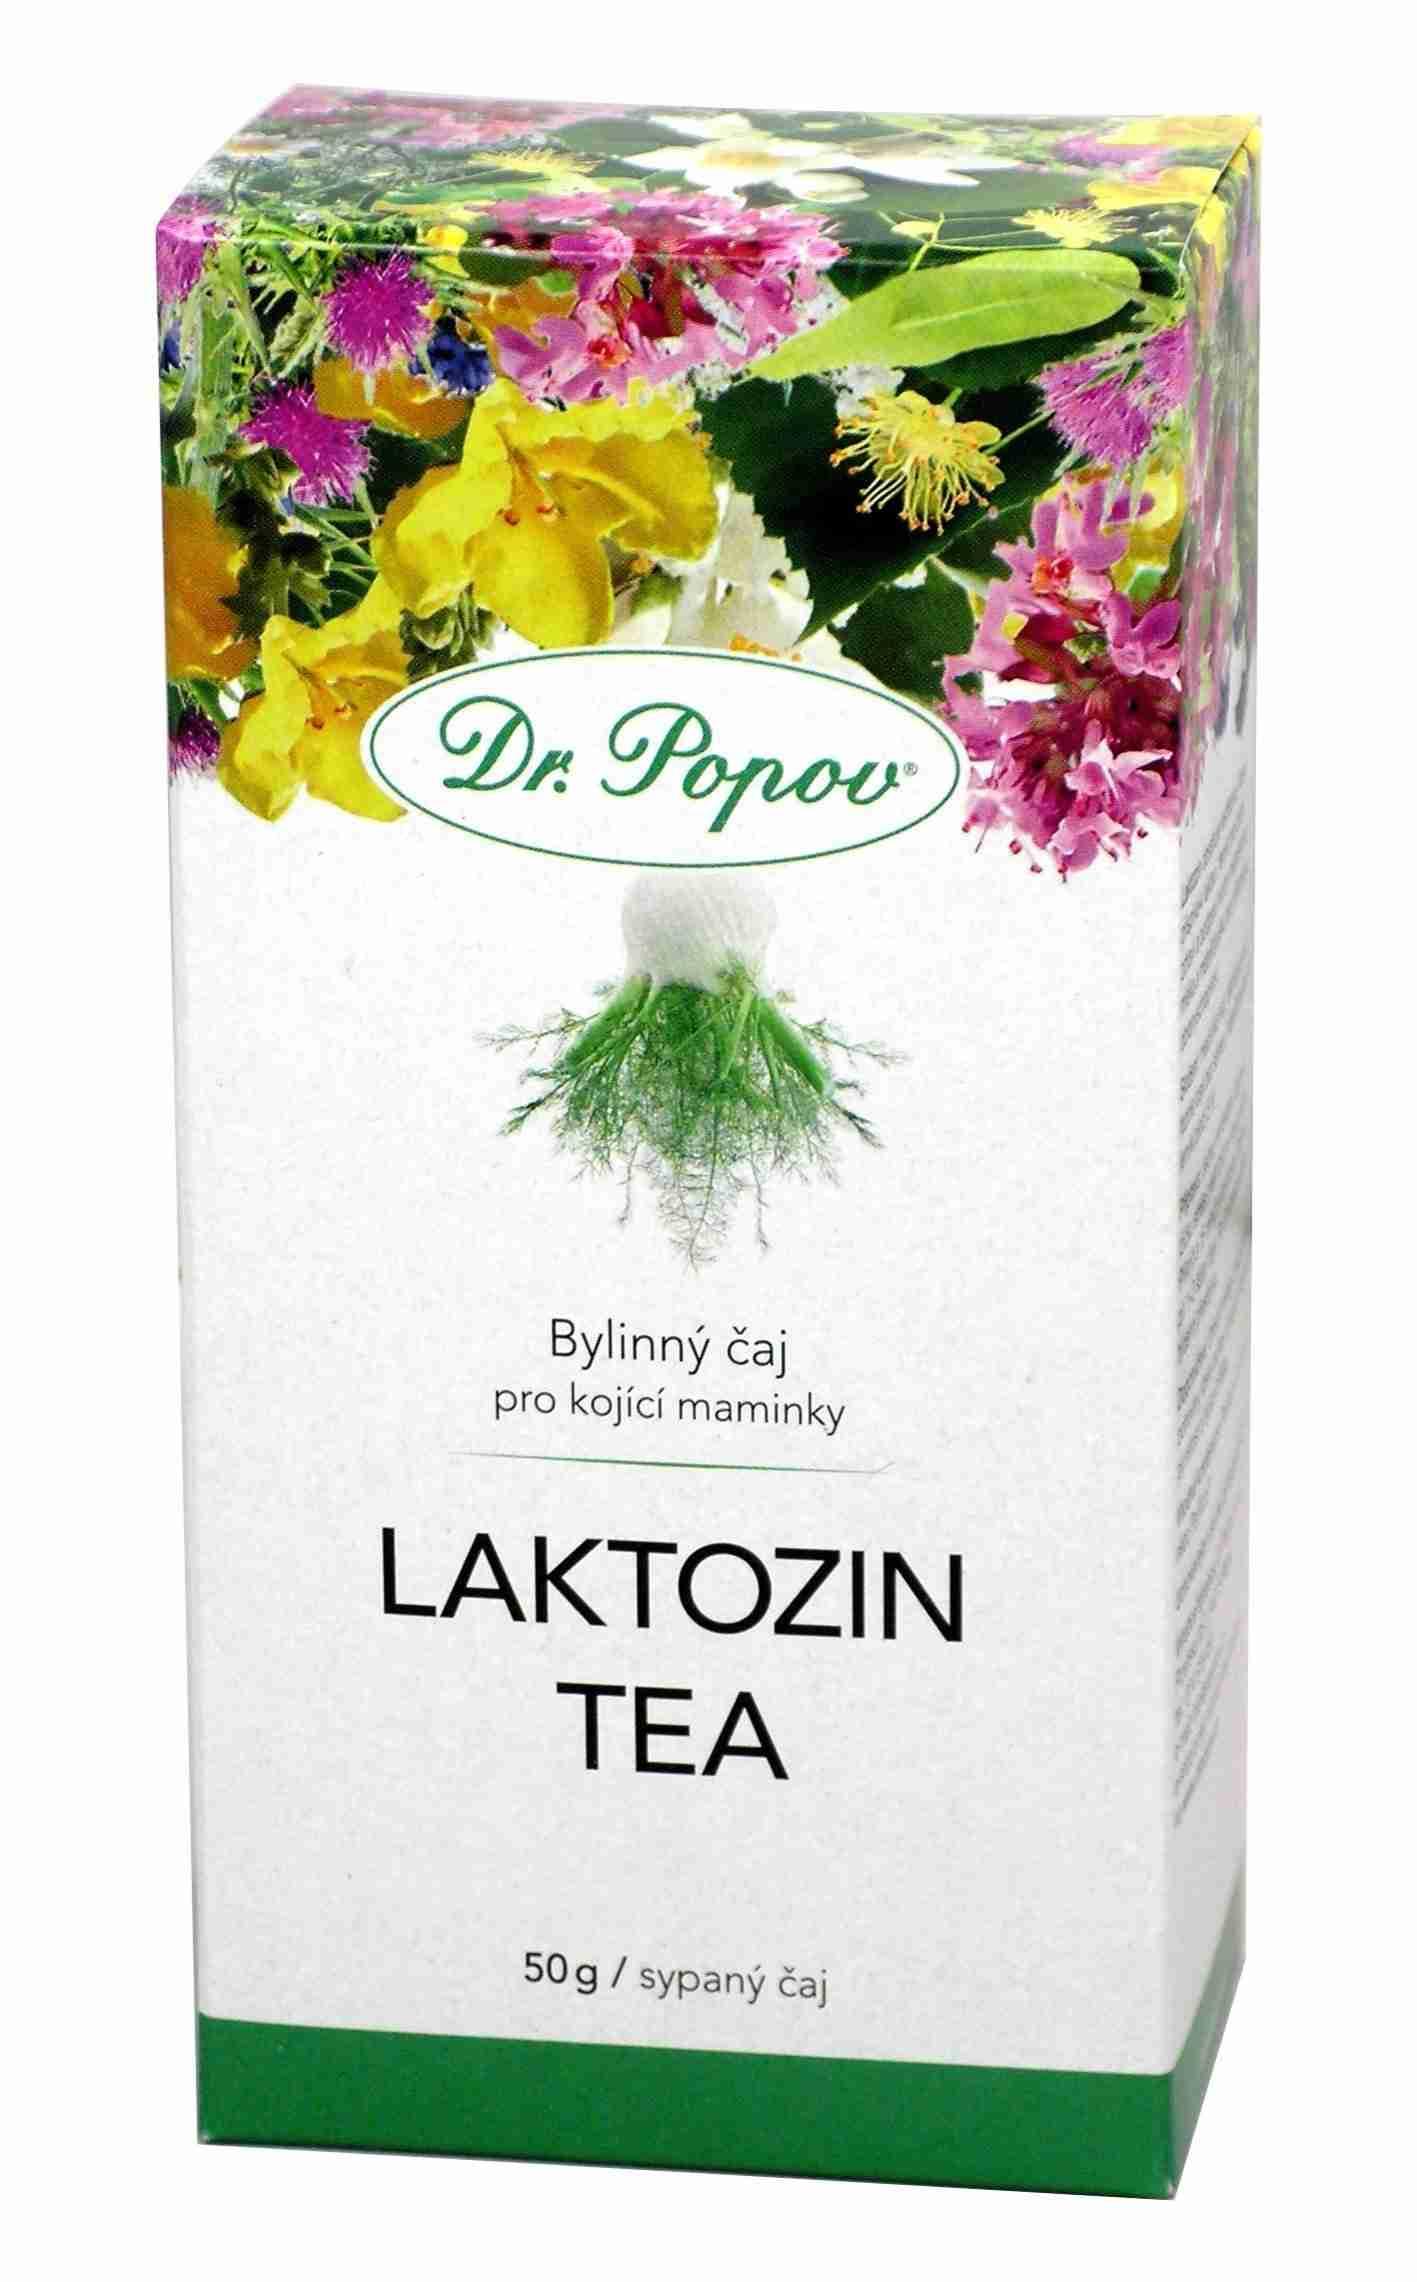 Dr. Popov Laktozin tea sypaný 50 g